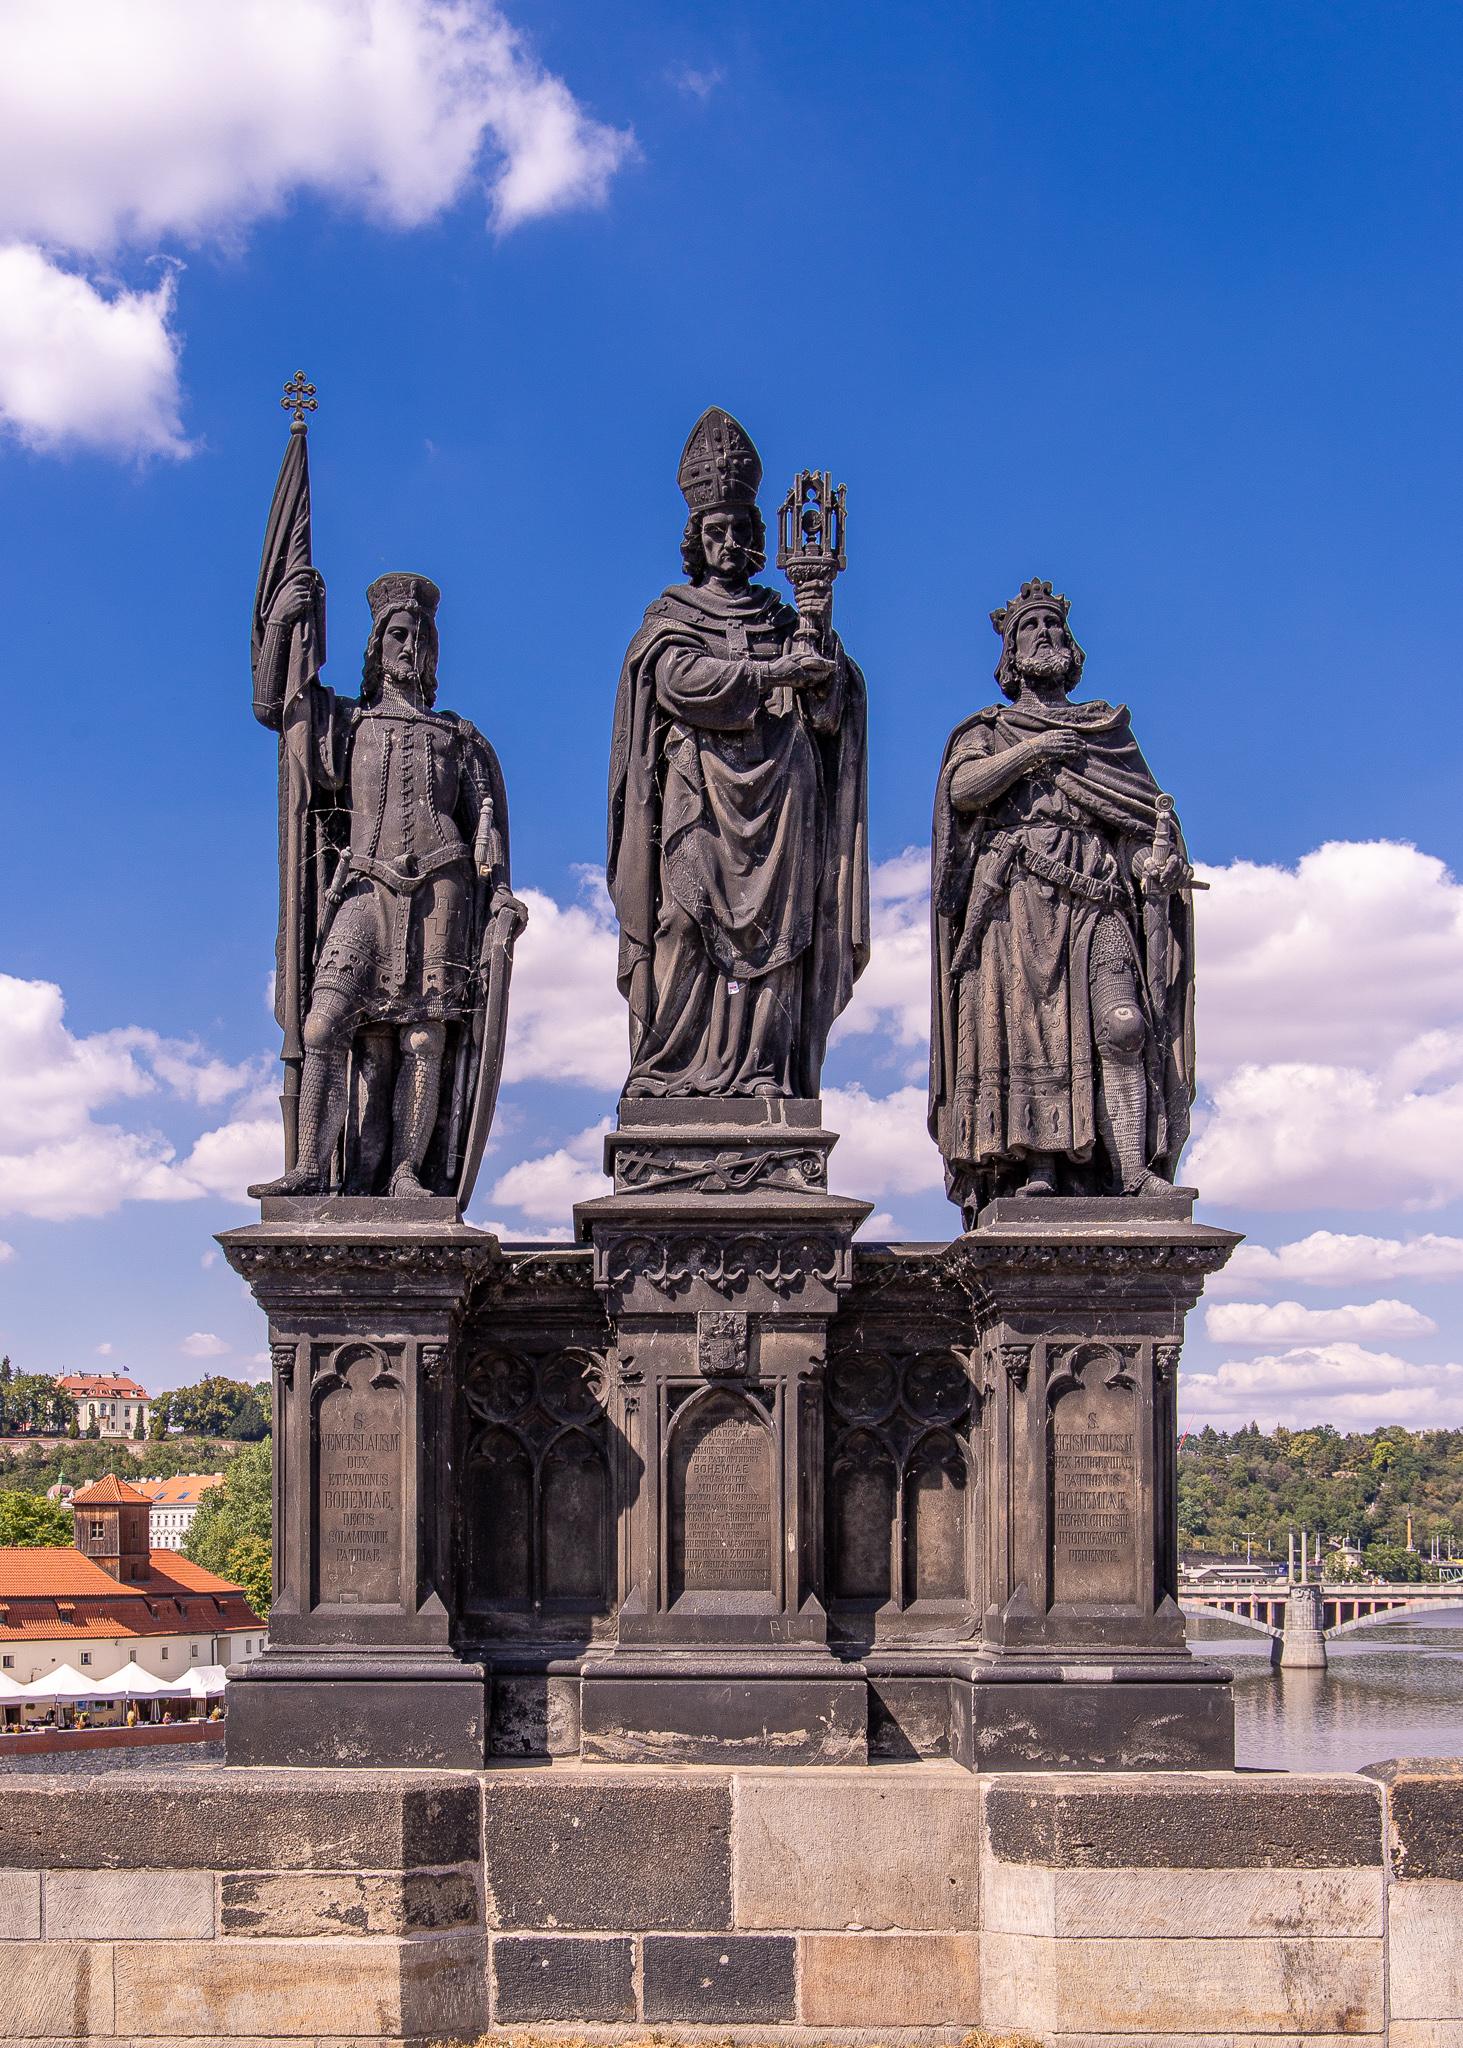 Statues Of Sts. Norbert, Wenceslas and Sigismond